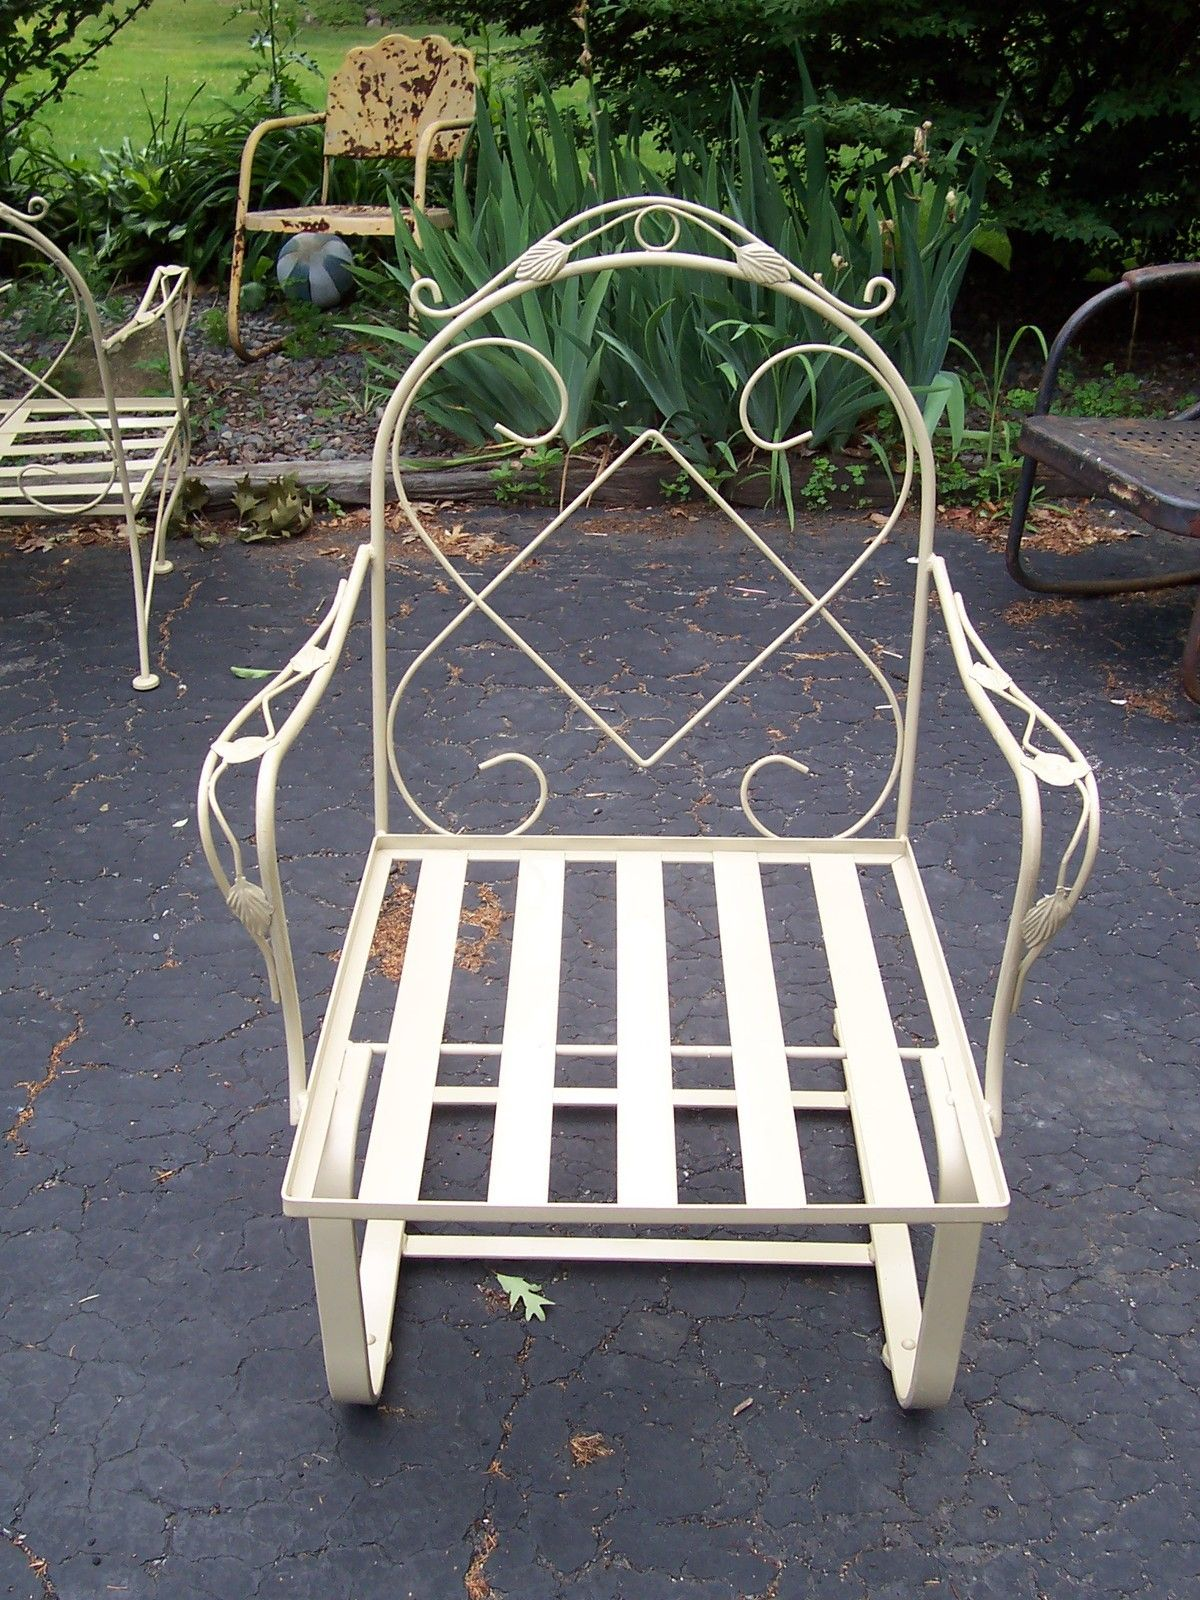 Woodard Lyon Shaw Rocker Chair Offered On Ebay Starting